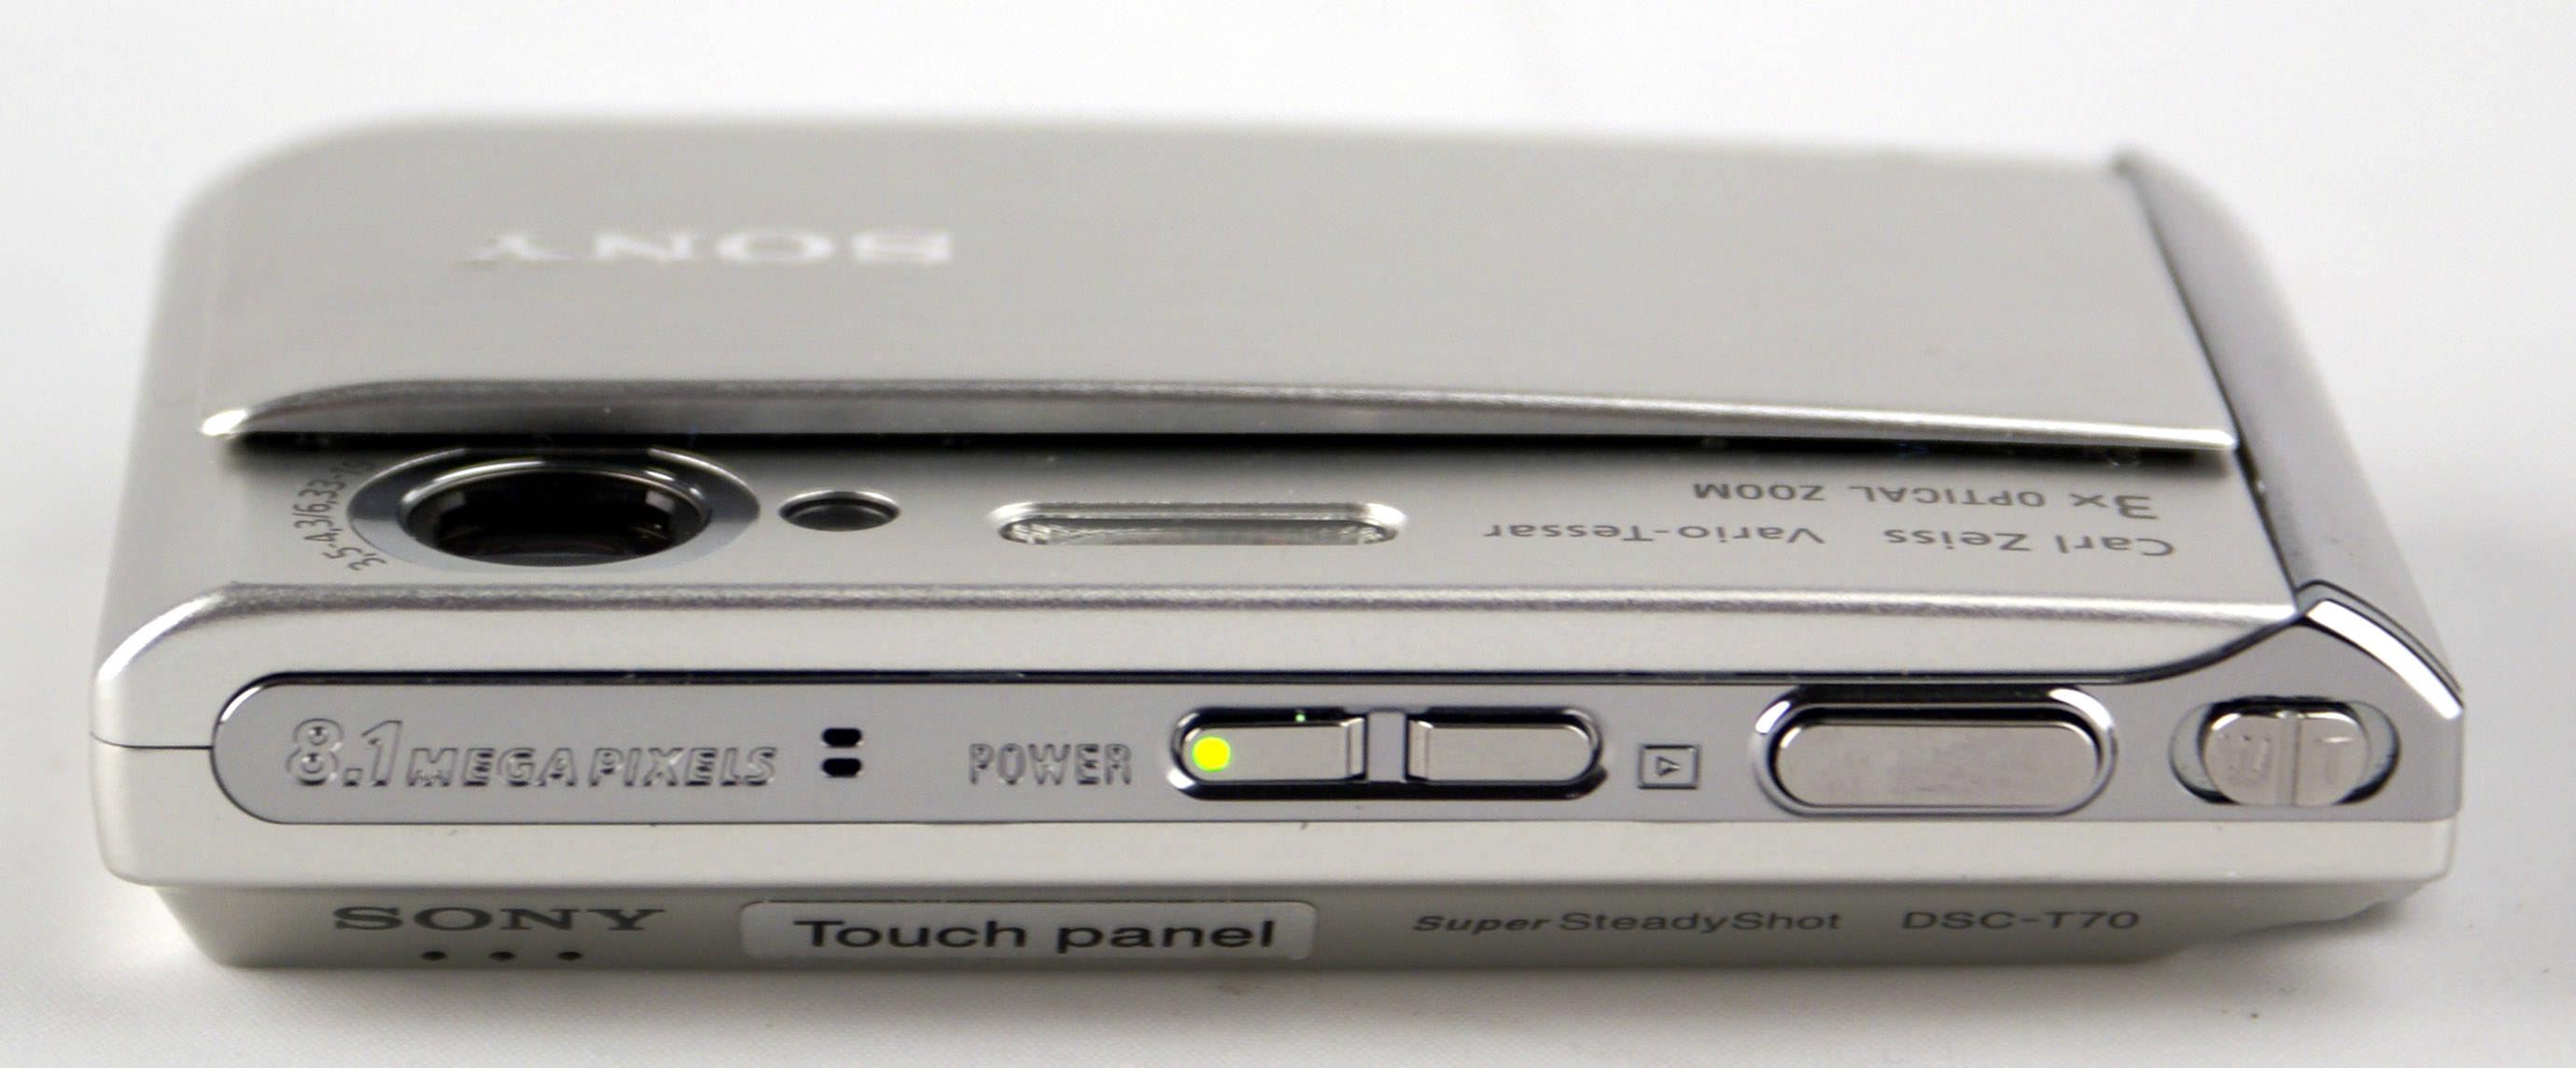 Sony dsc-hx200v driver